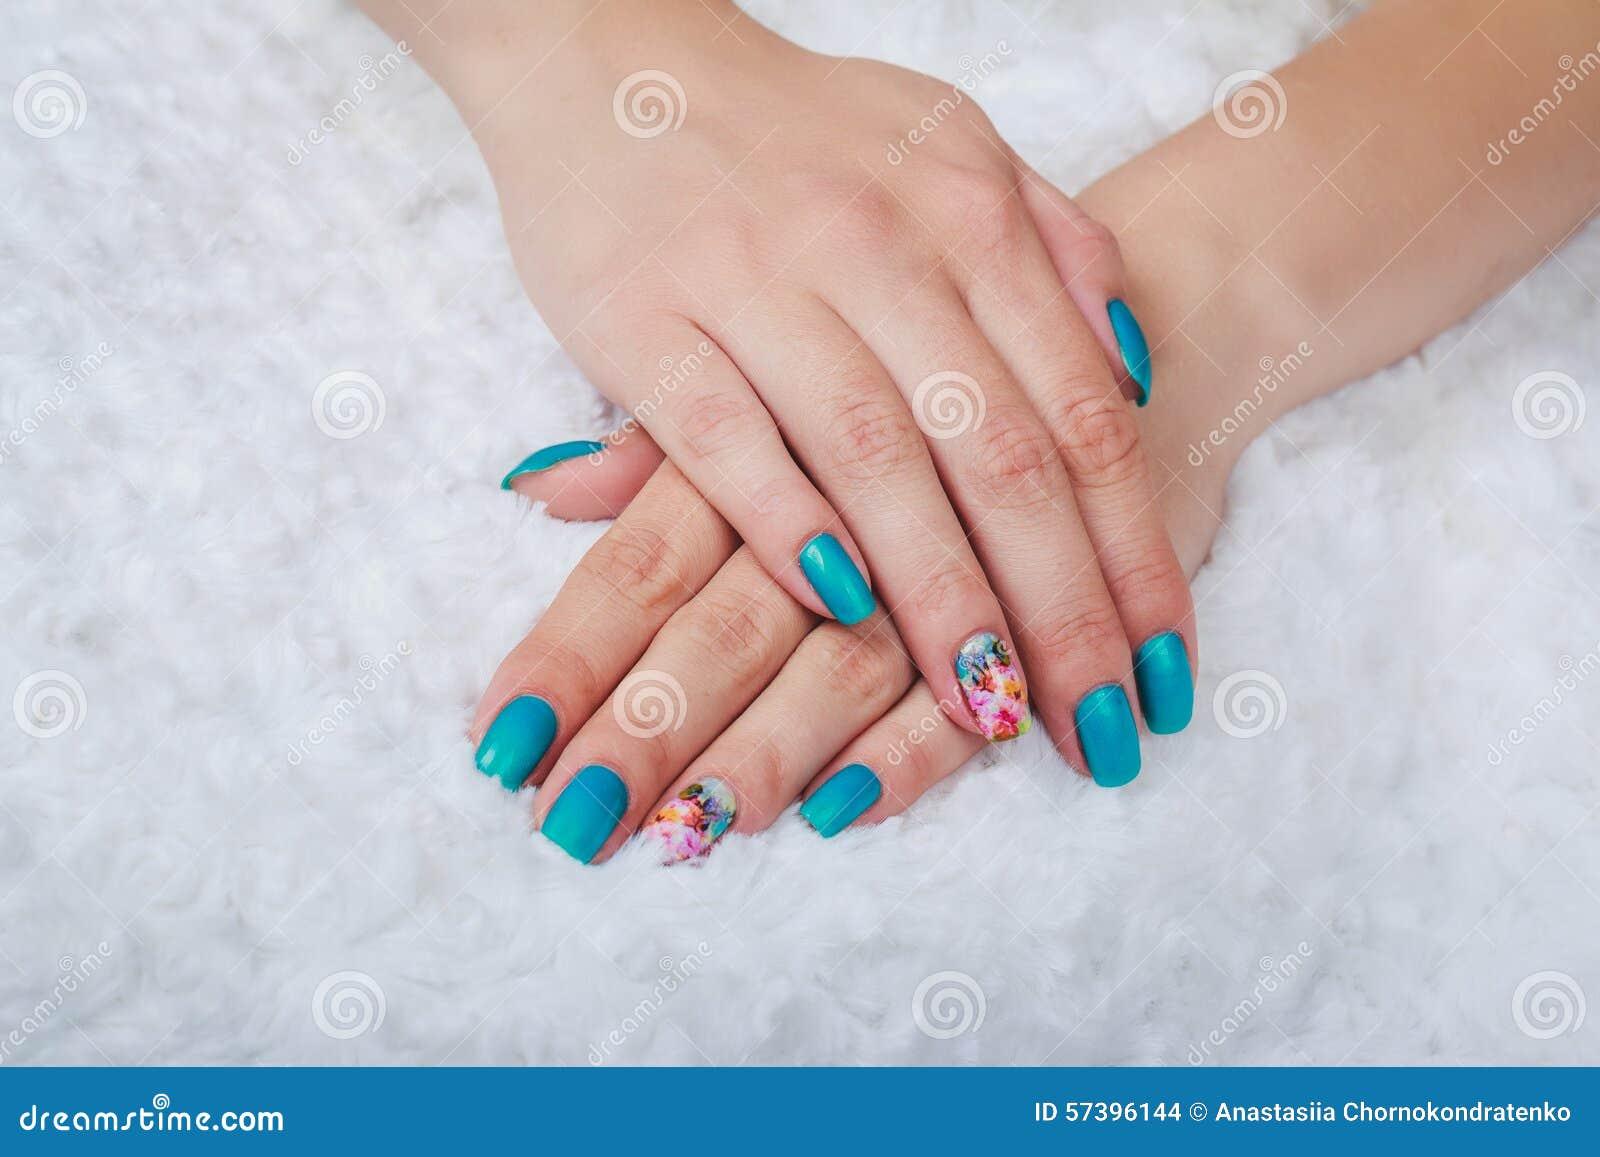 Light Blue Nail Art Stock Photo Image Of Light Hand 57396144